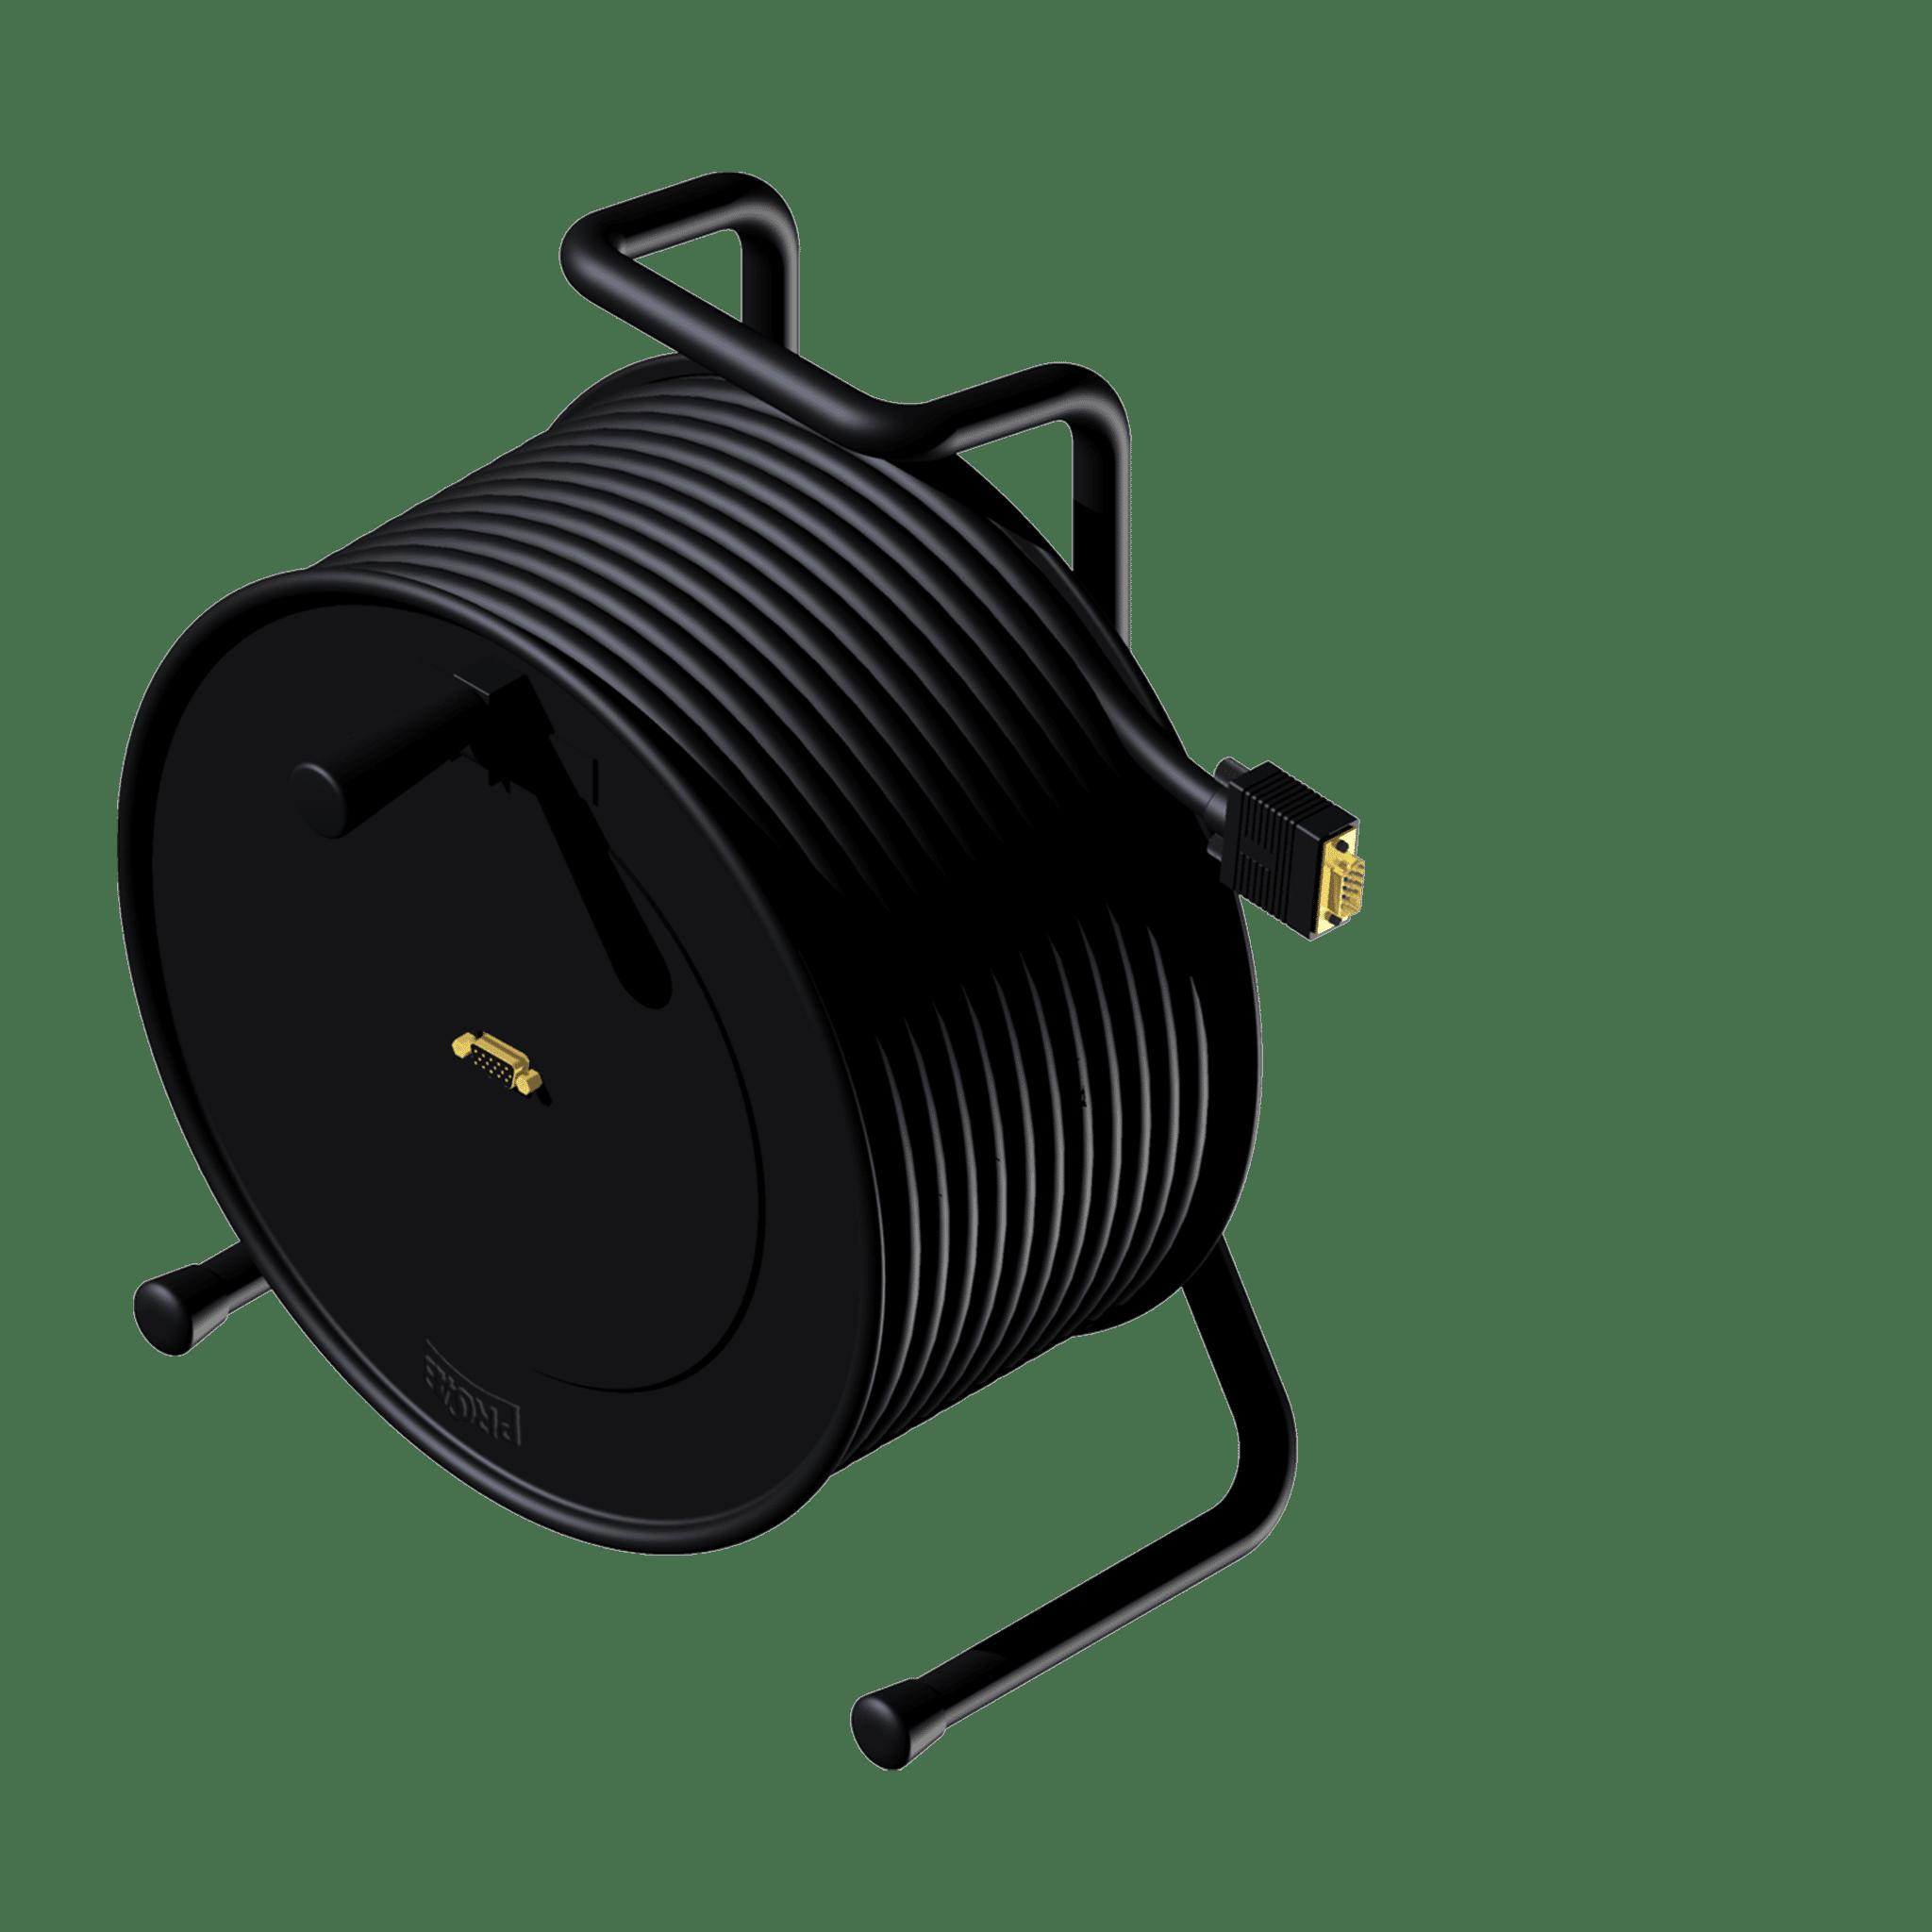 CRX650 - Cable reel - SVGA female - SVGA male